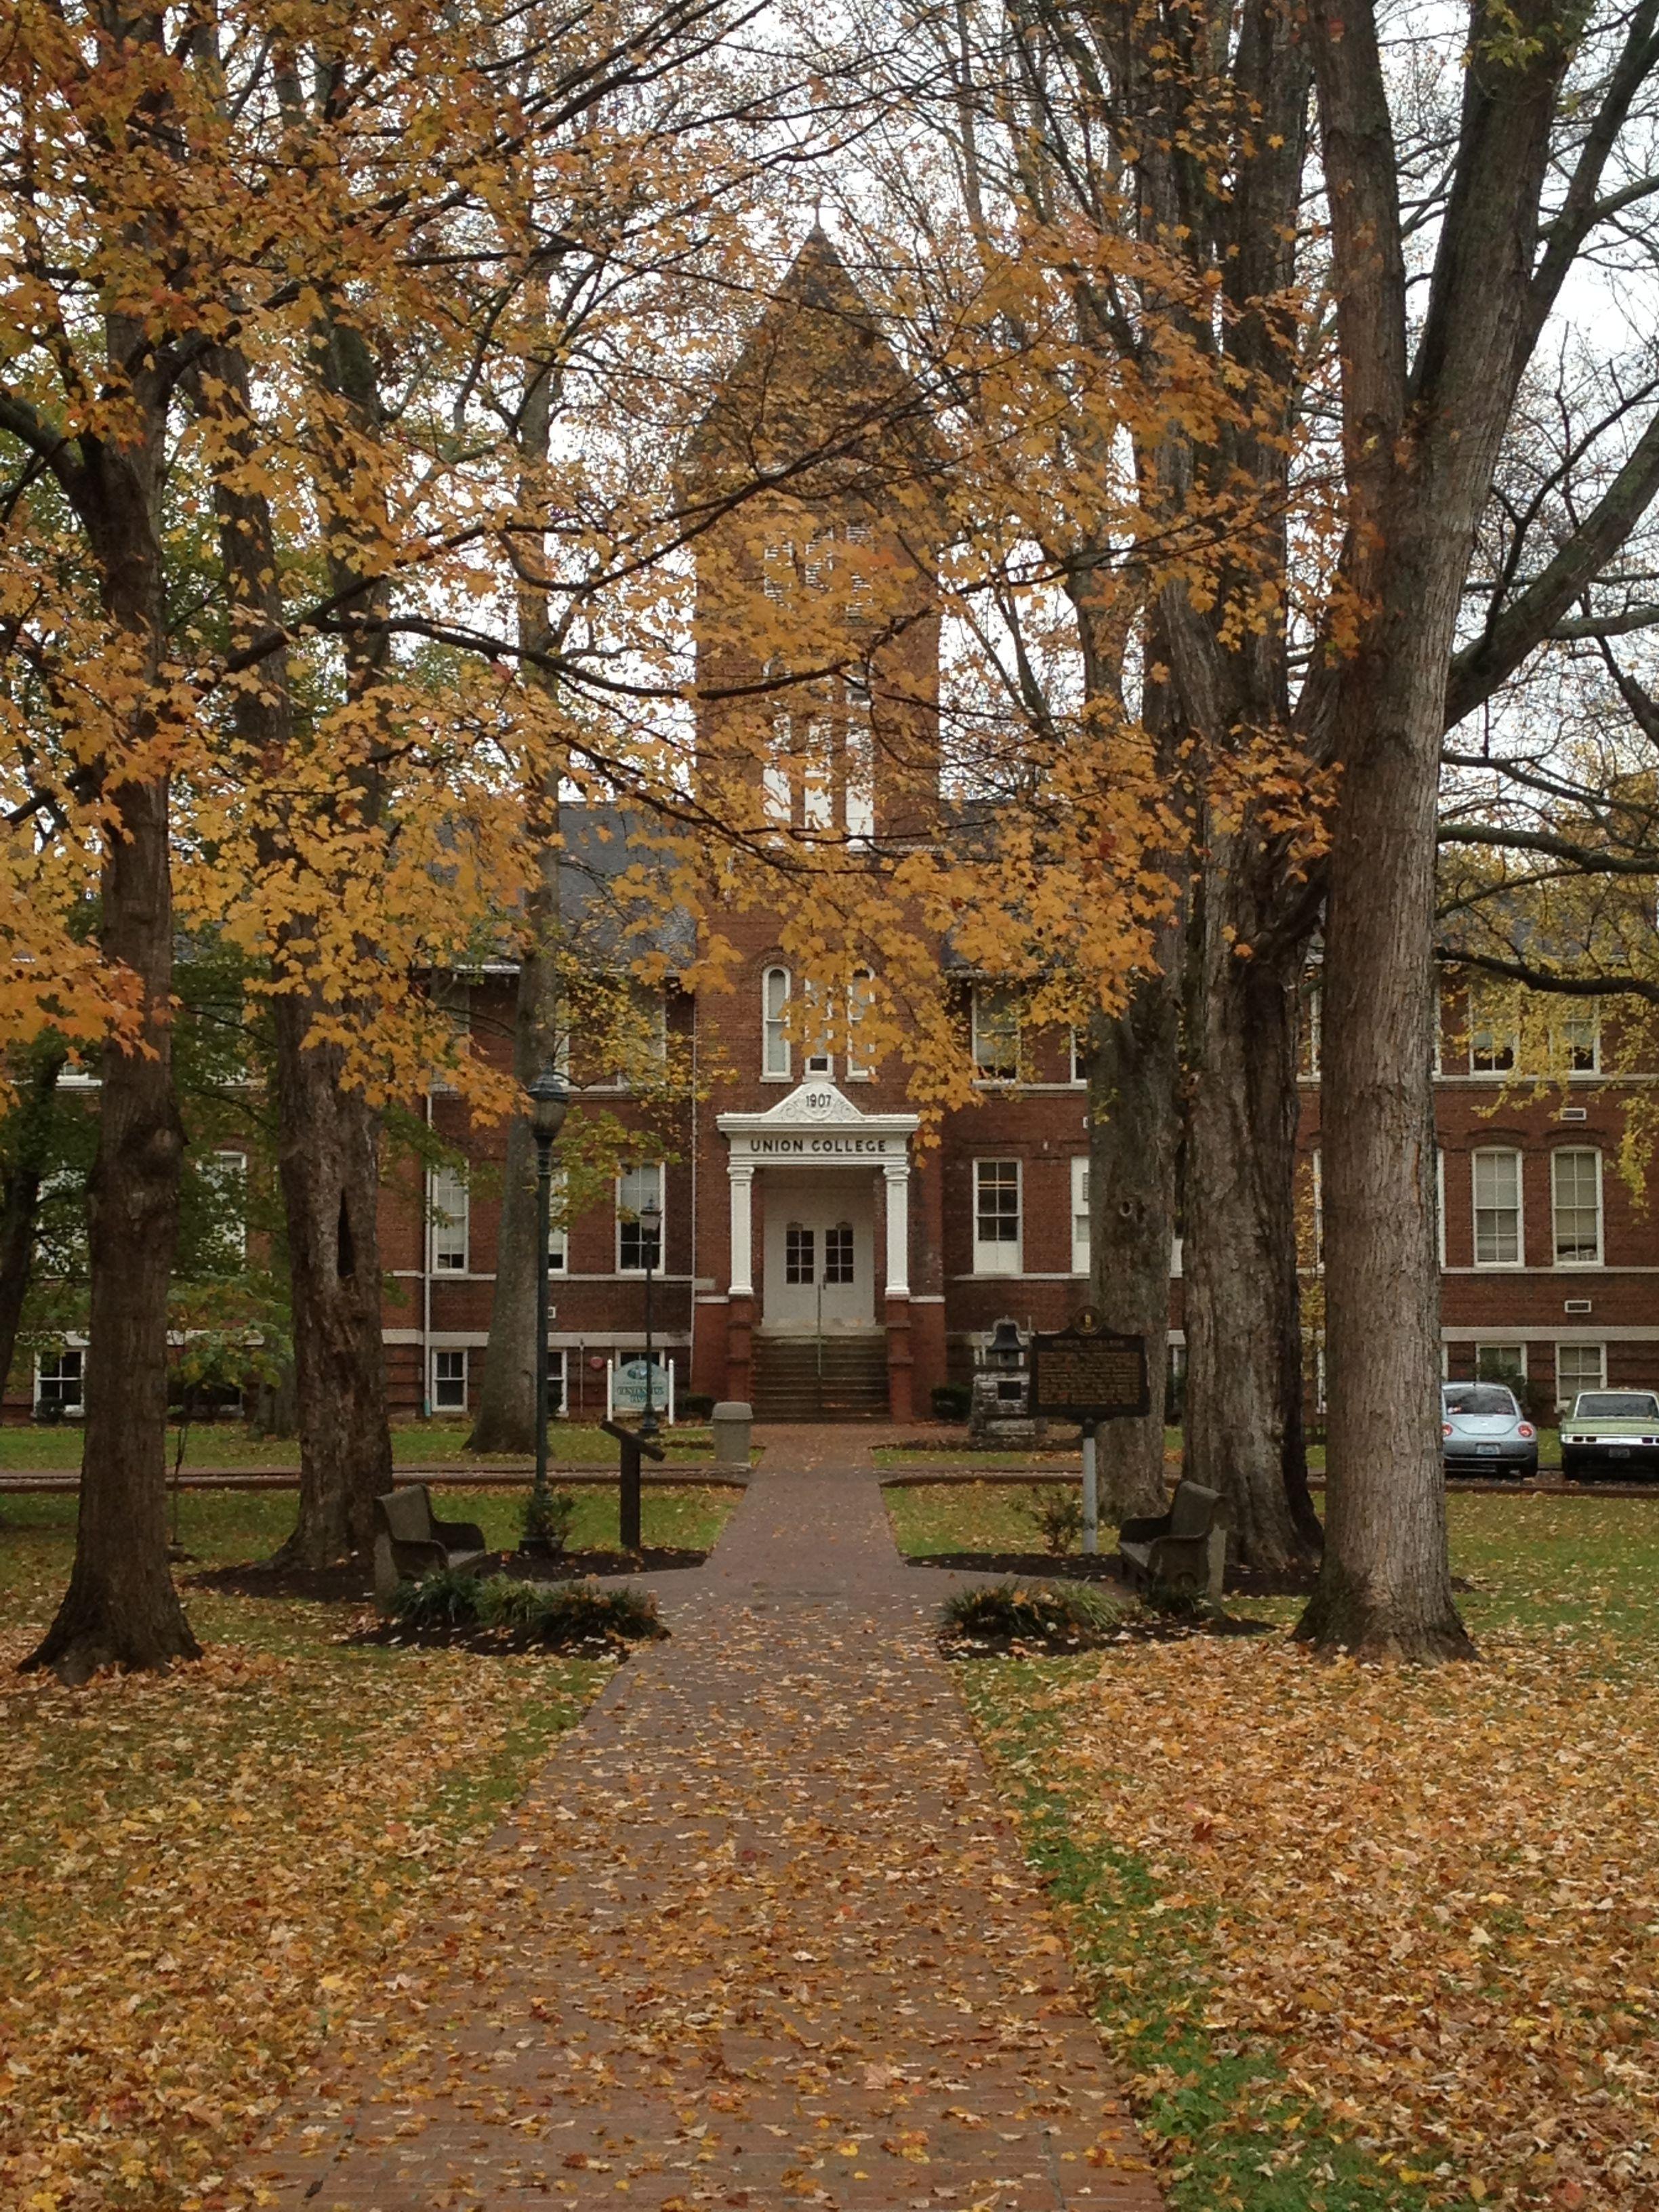 Union College Barbourville Kentucky Union College Appalachia